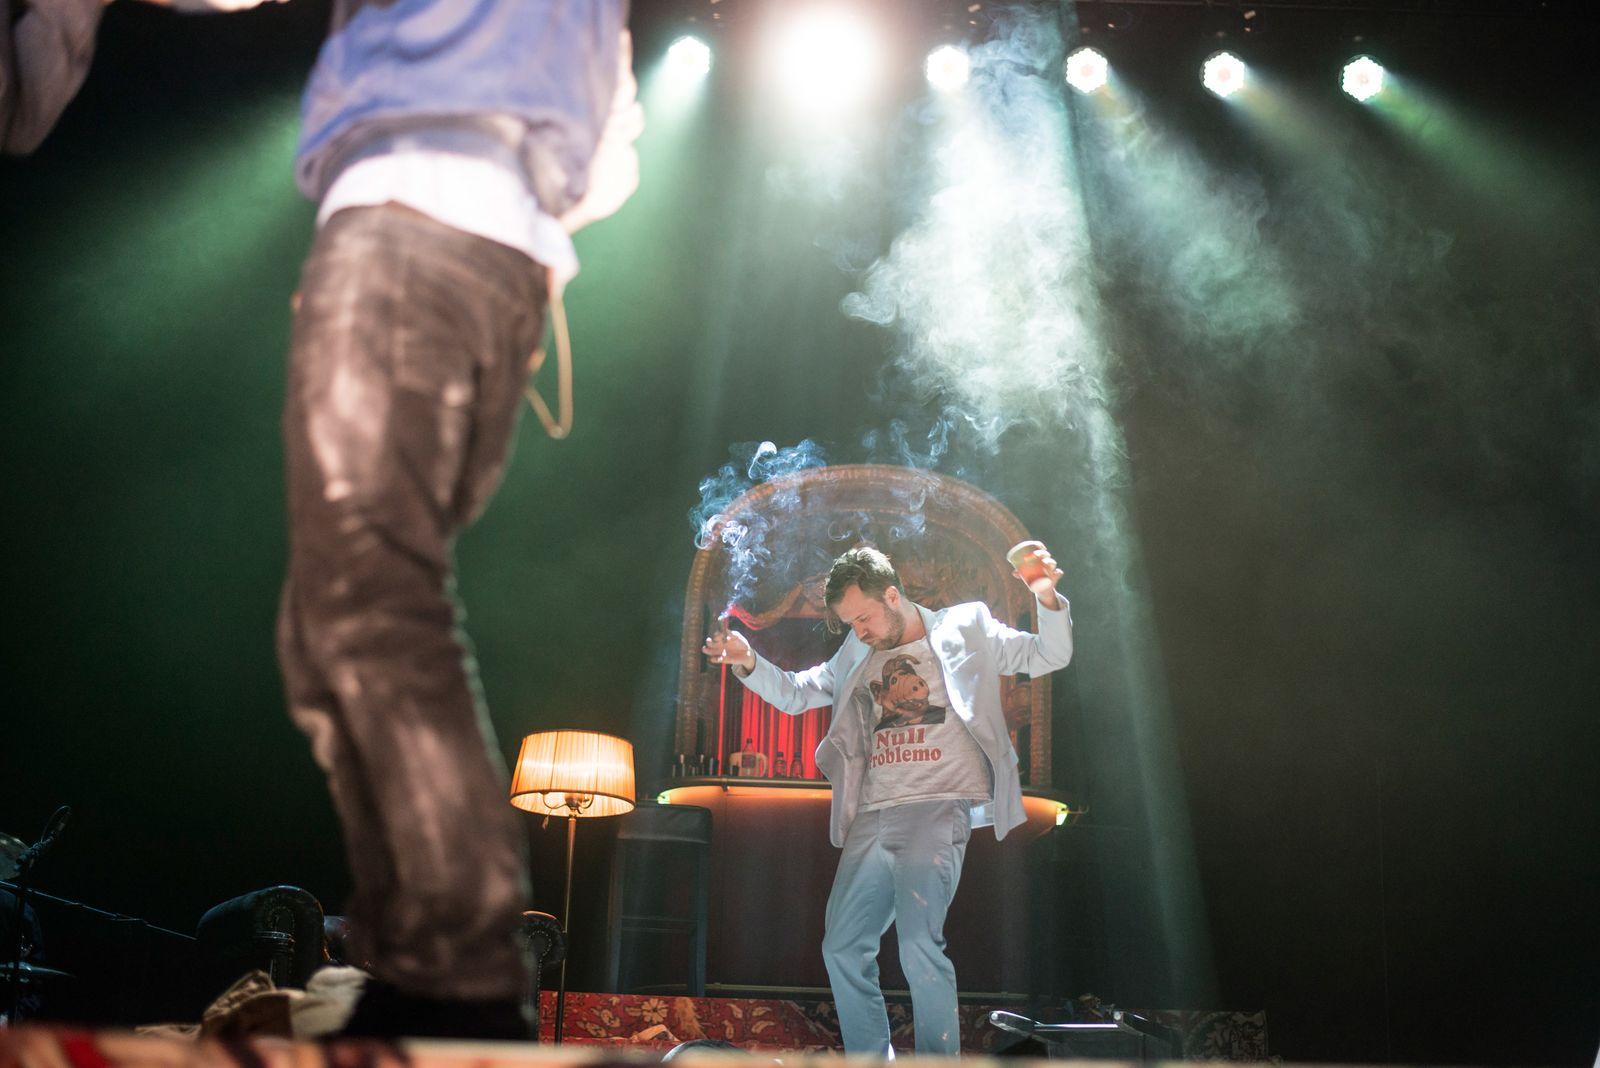 Panikherz/BERLINER ENSEMBLE/Regie/Bearbeitung: Oliver Reese/Bühne: Hansjörg Hartung/Kostüme: Elina Schnizler/Musik: Jörg Gollasch/Dramaturgie: Valerie Göhring